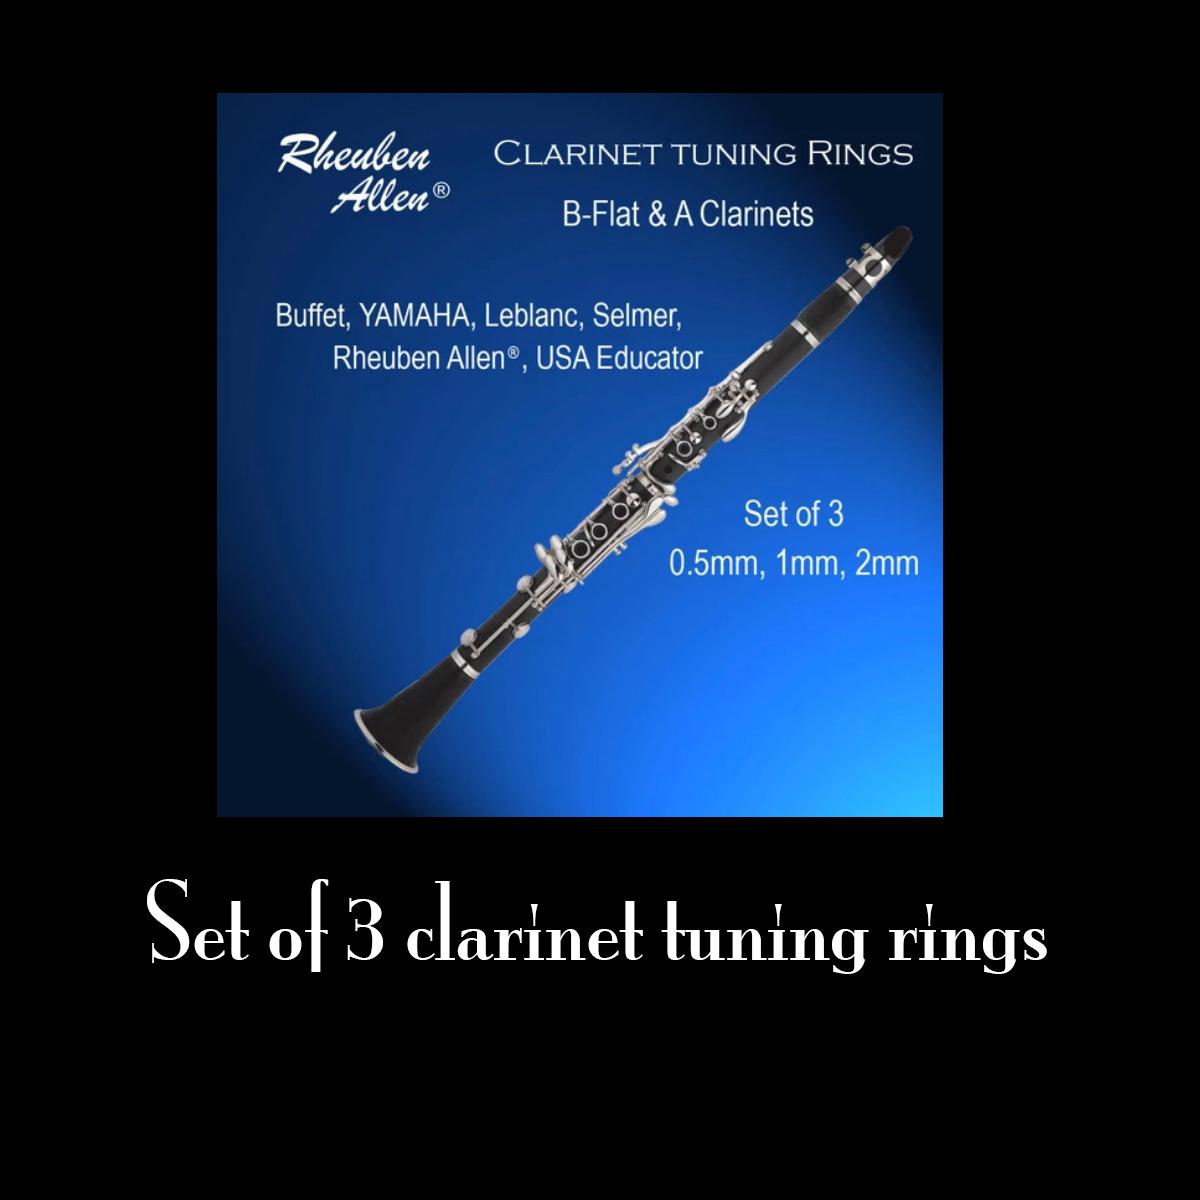 RA Tuning rings 2.0